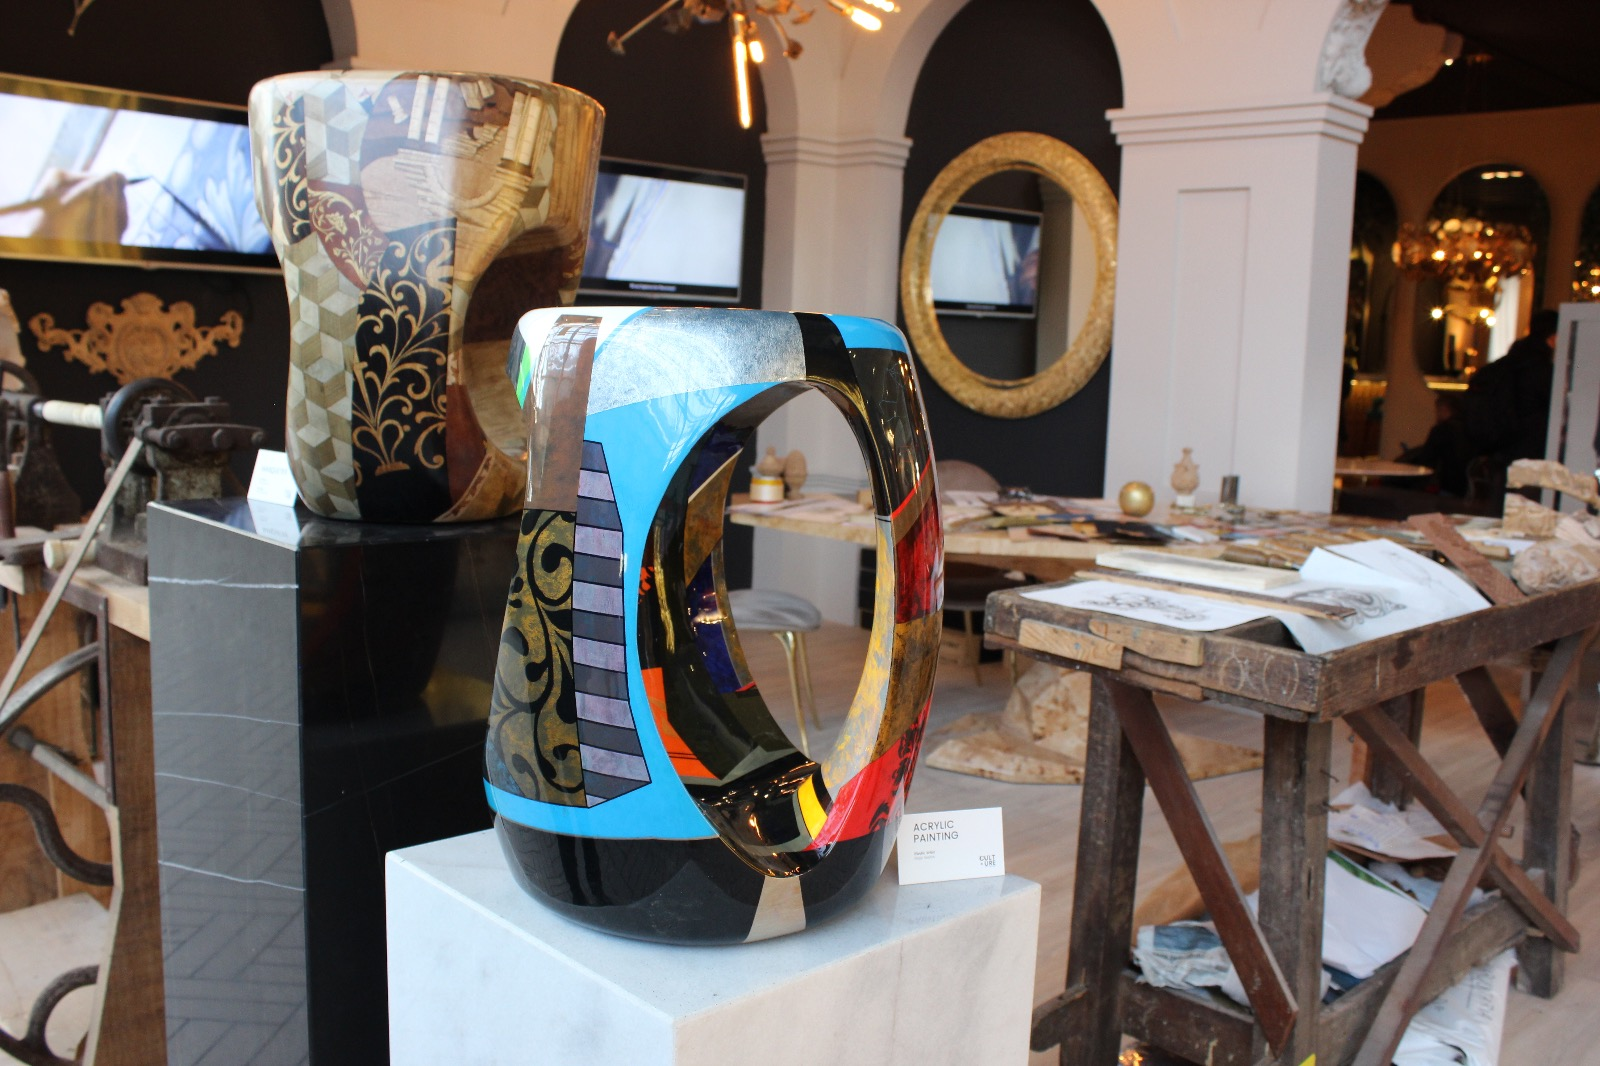 Wonderful Craftsmanship at Covet House in MO 2019 - Marquetry maison et objet Wonderful Craftsmanship at Covet Group in Maison et Objet 2019 Wonderful Craftsmanship at Covet House Marquetry